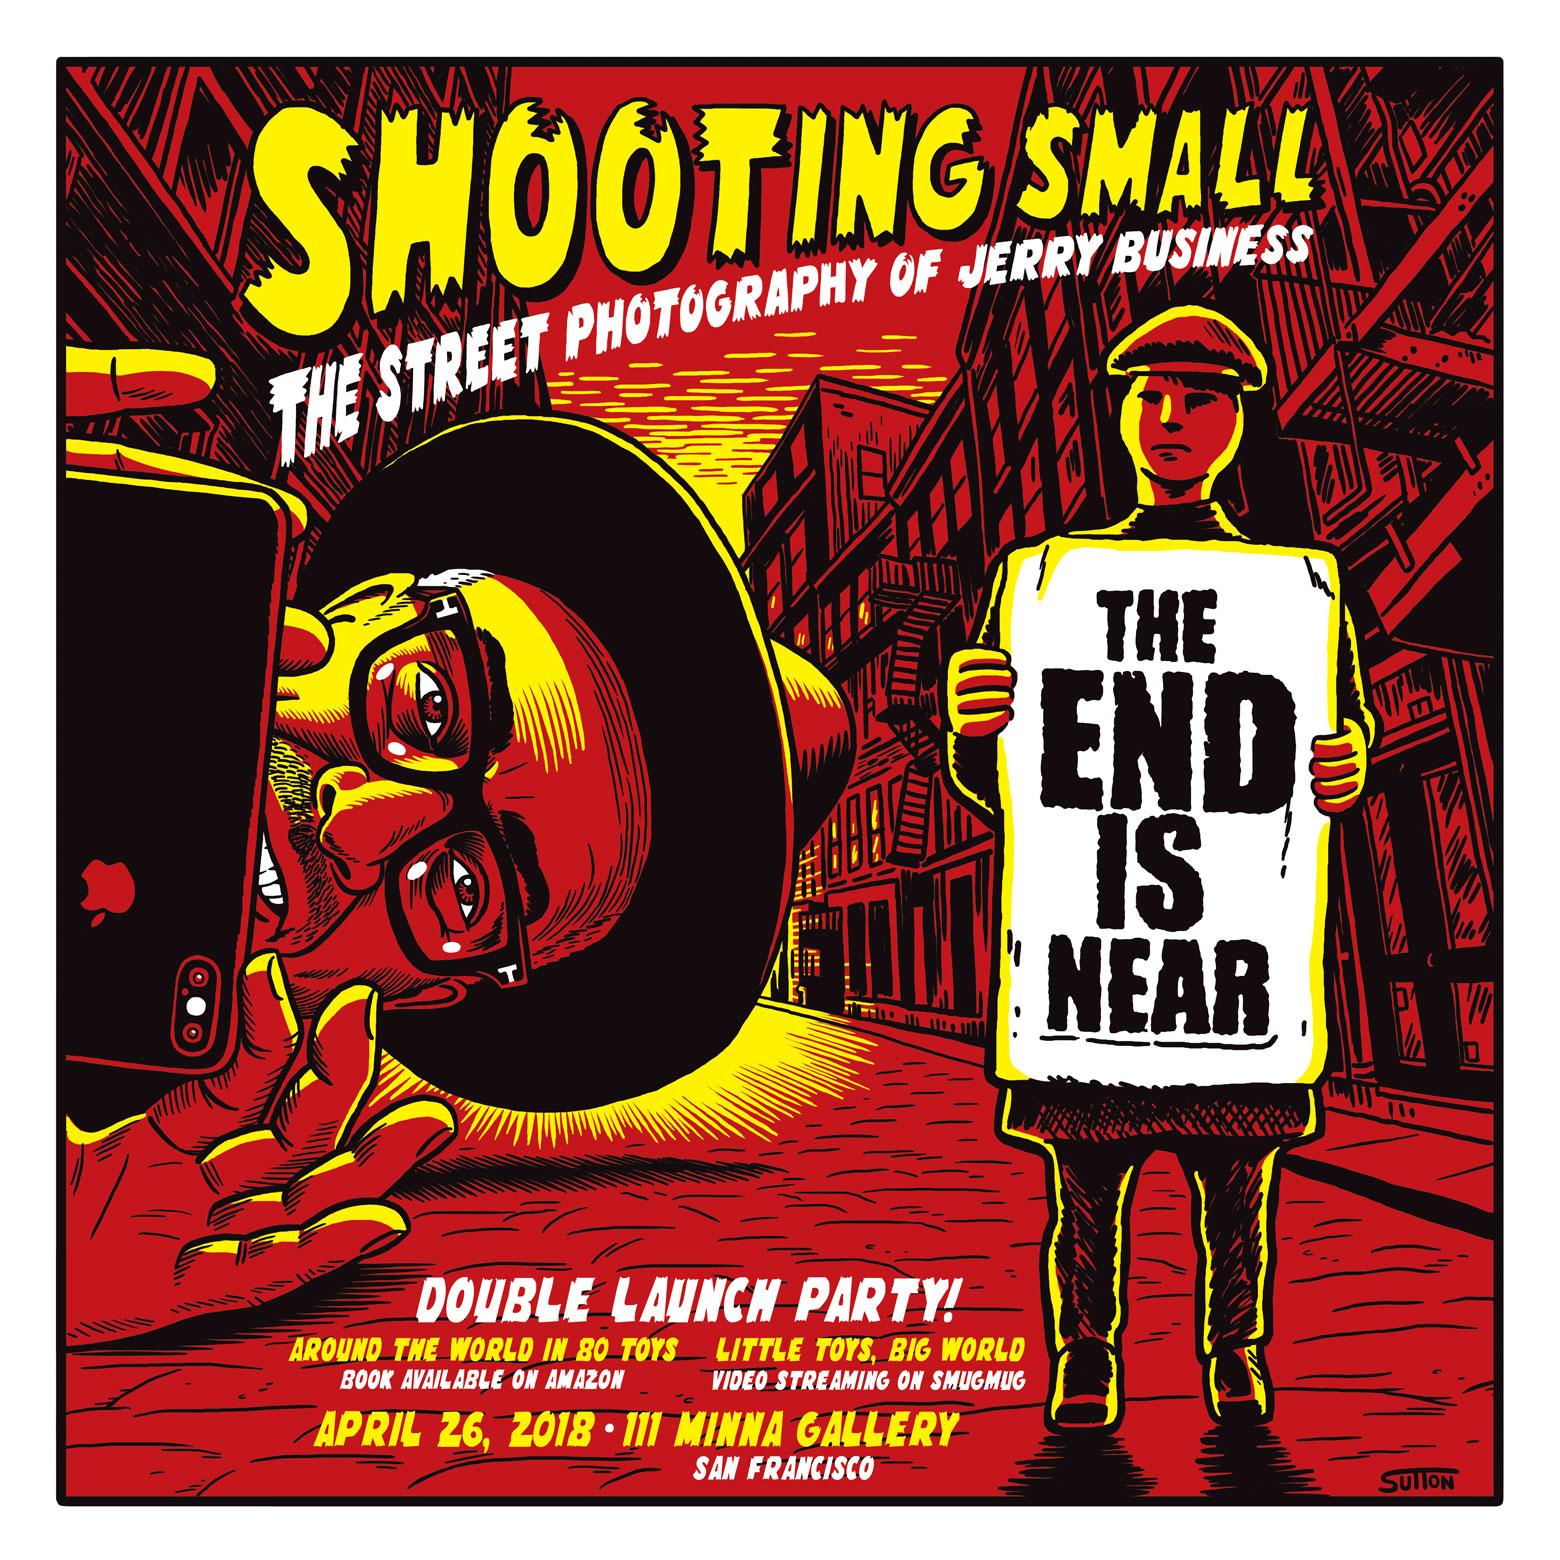 Shootingsmall_poster.jpg